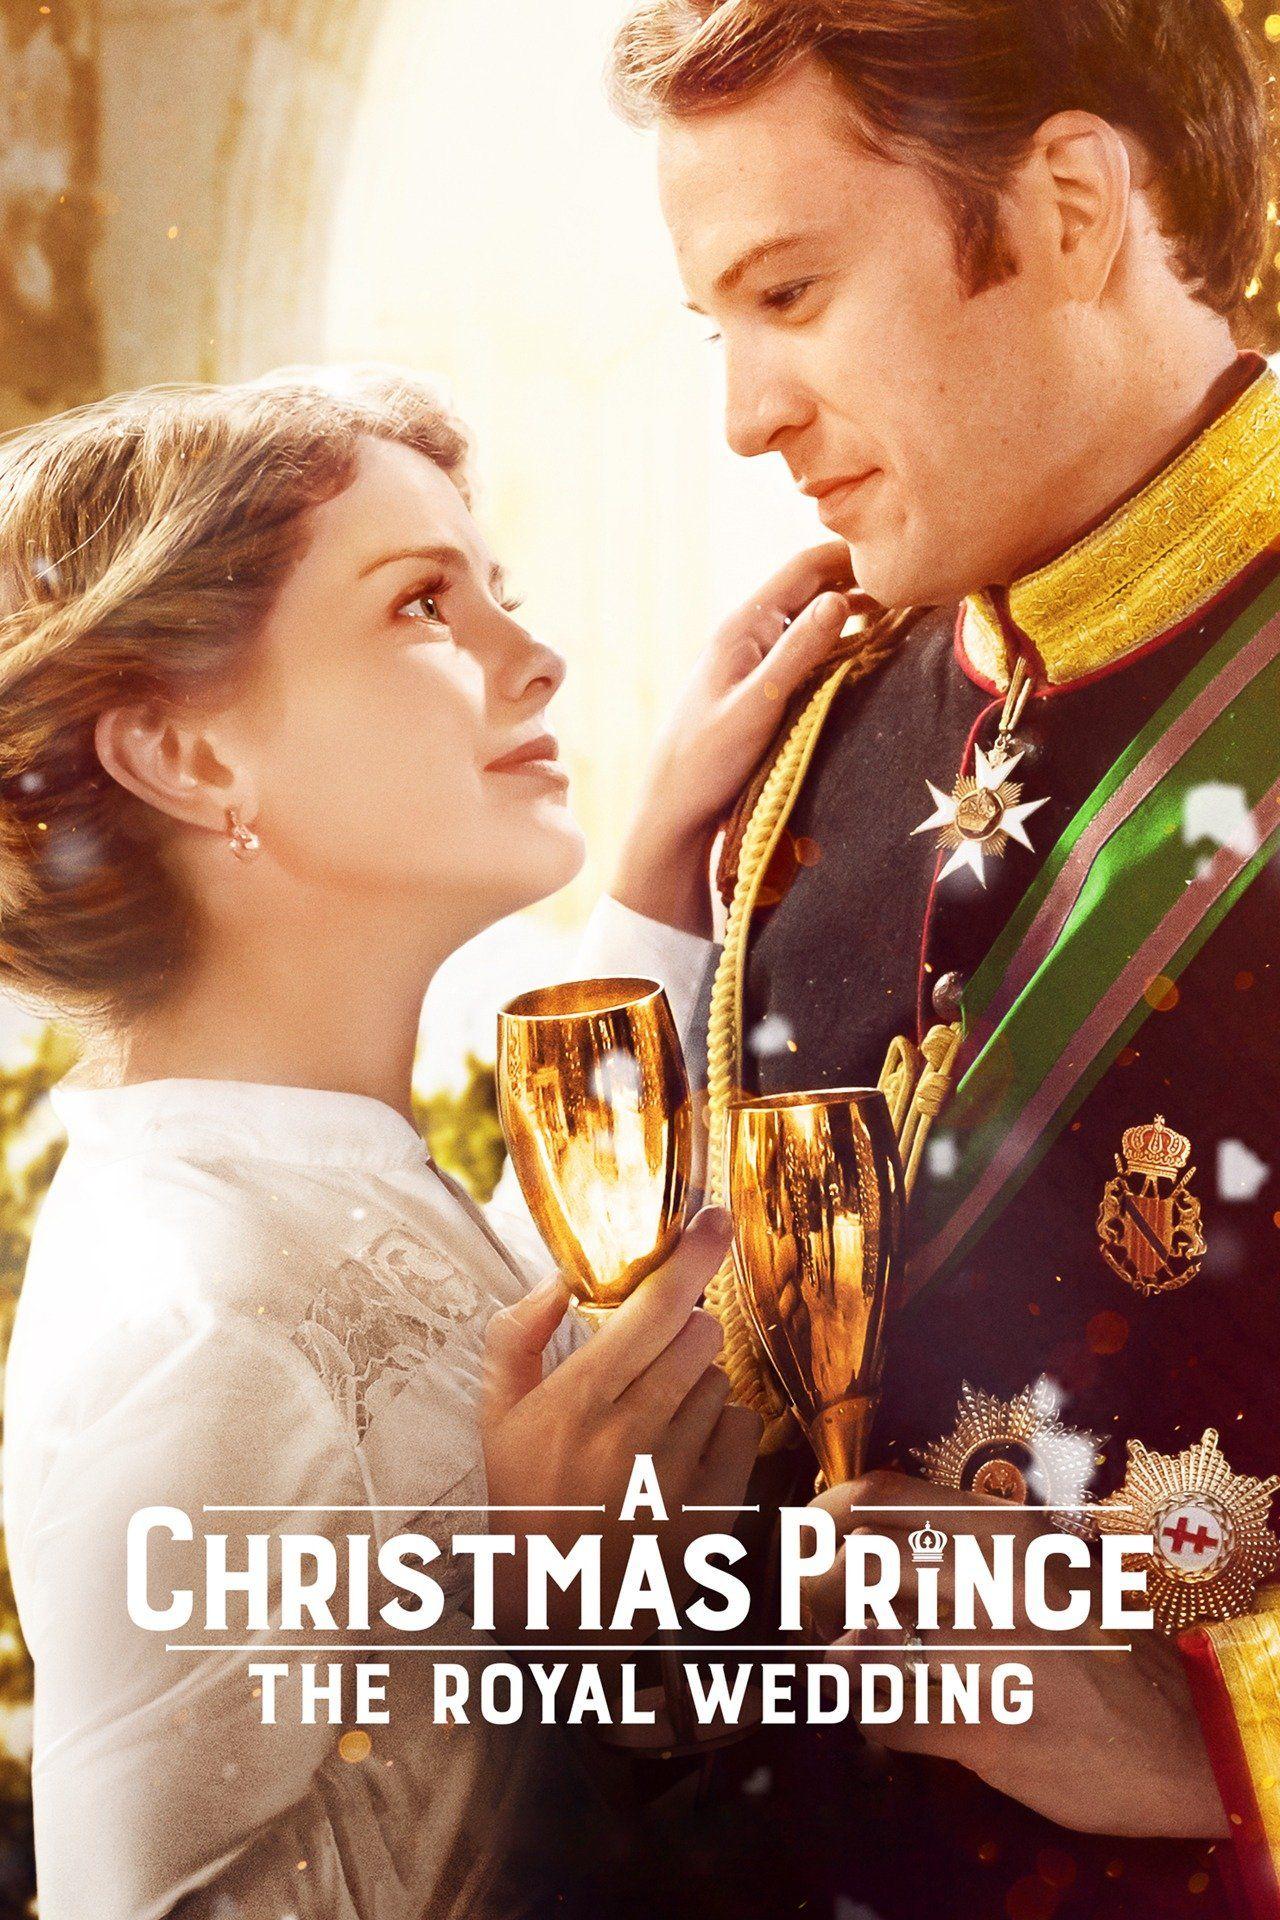 a christmas prince netflix movie